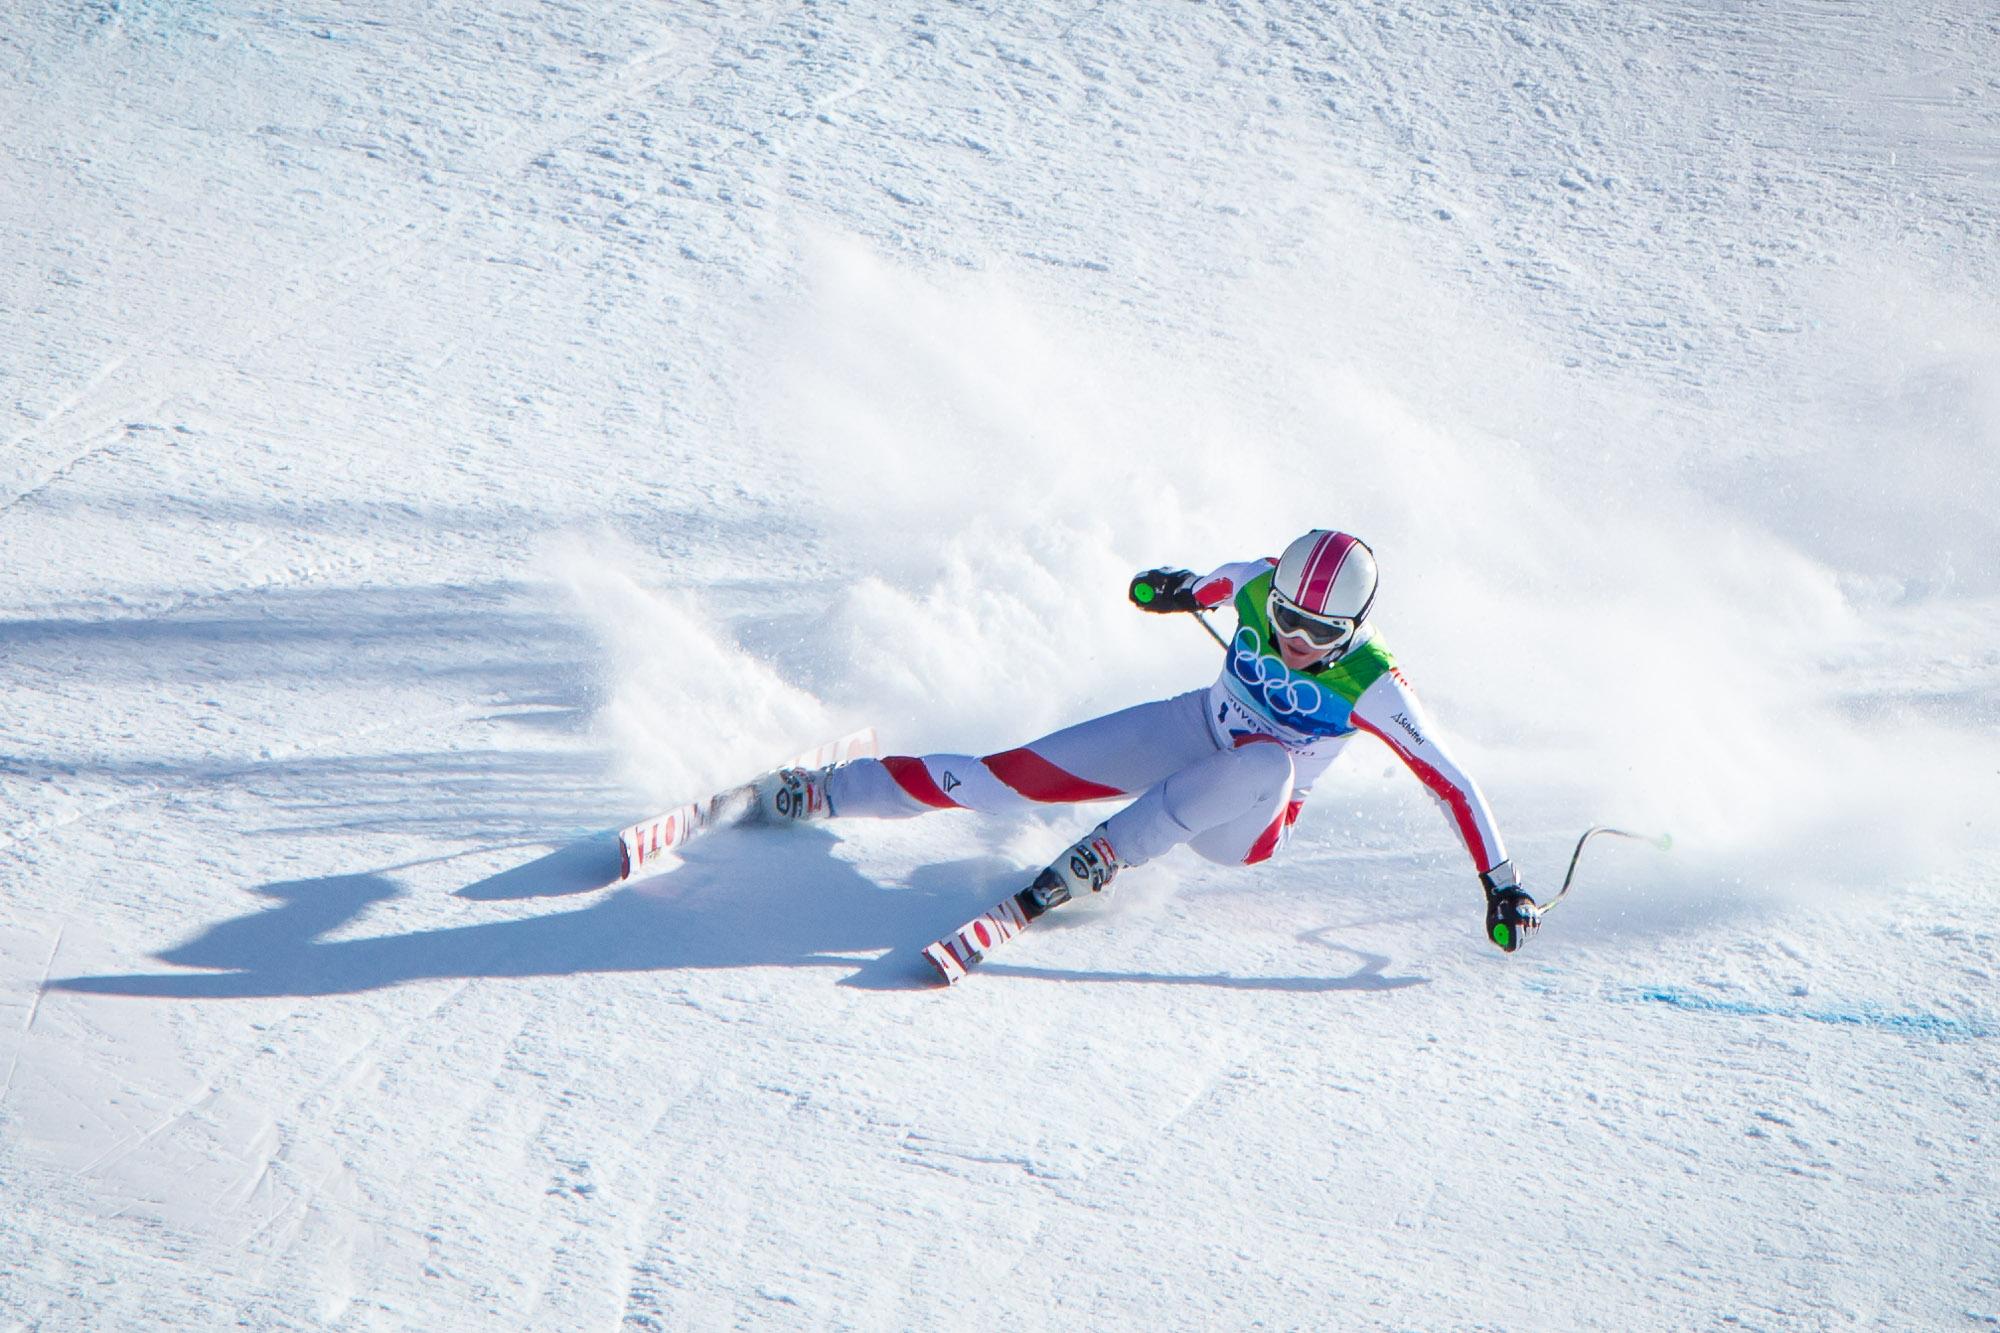 Justa-Jeskova-sport-events-photography-JJ006684.jpg